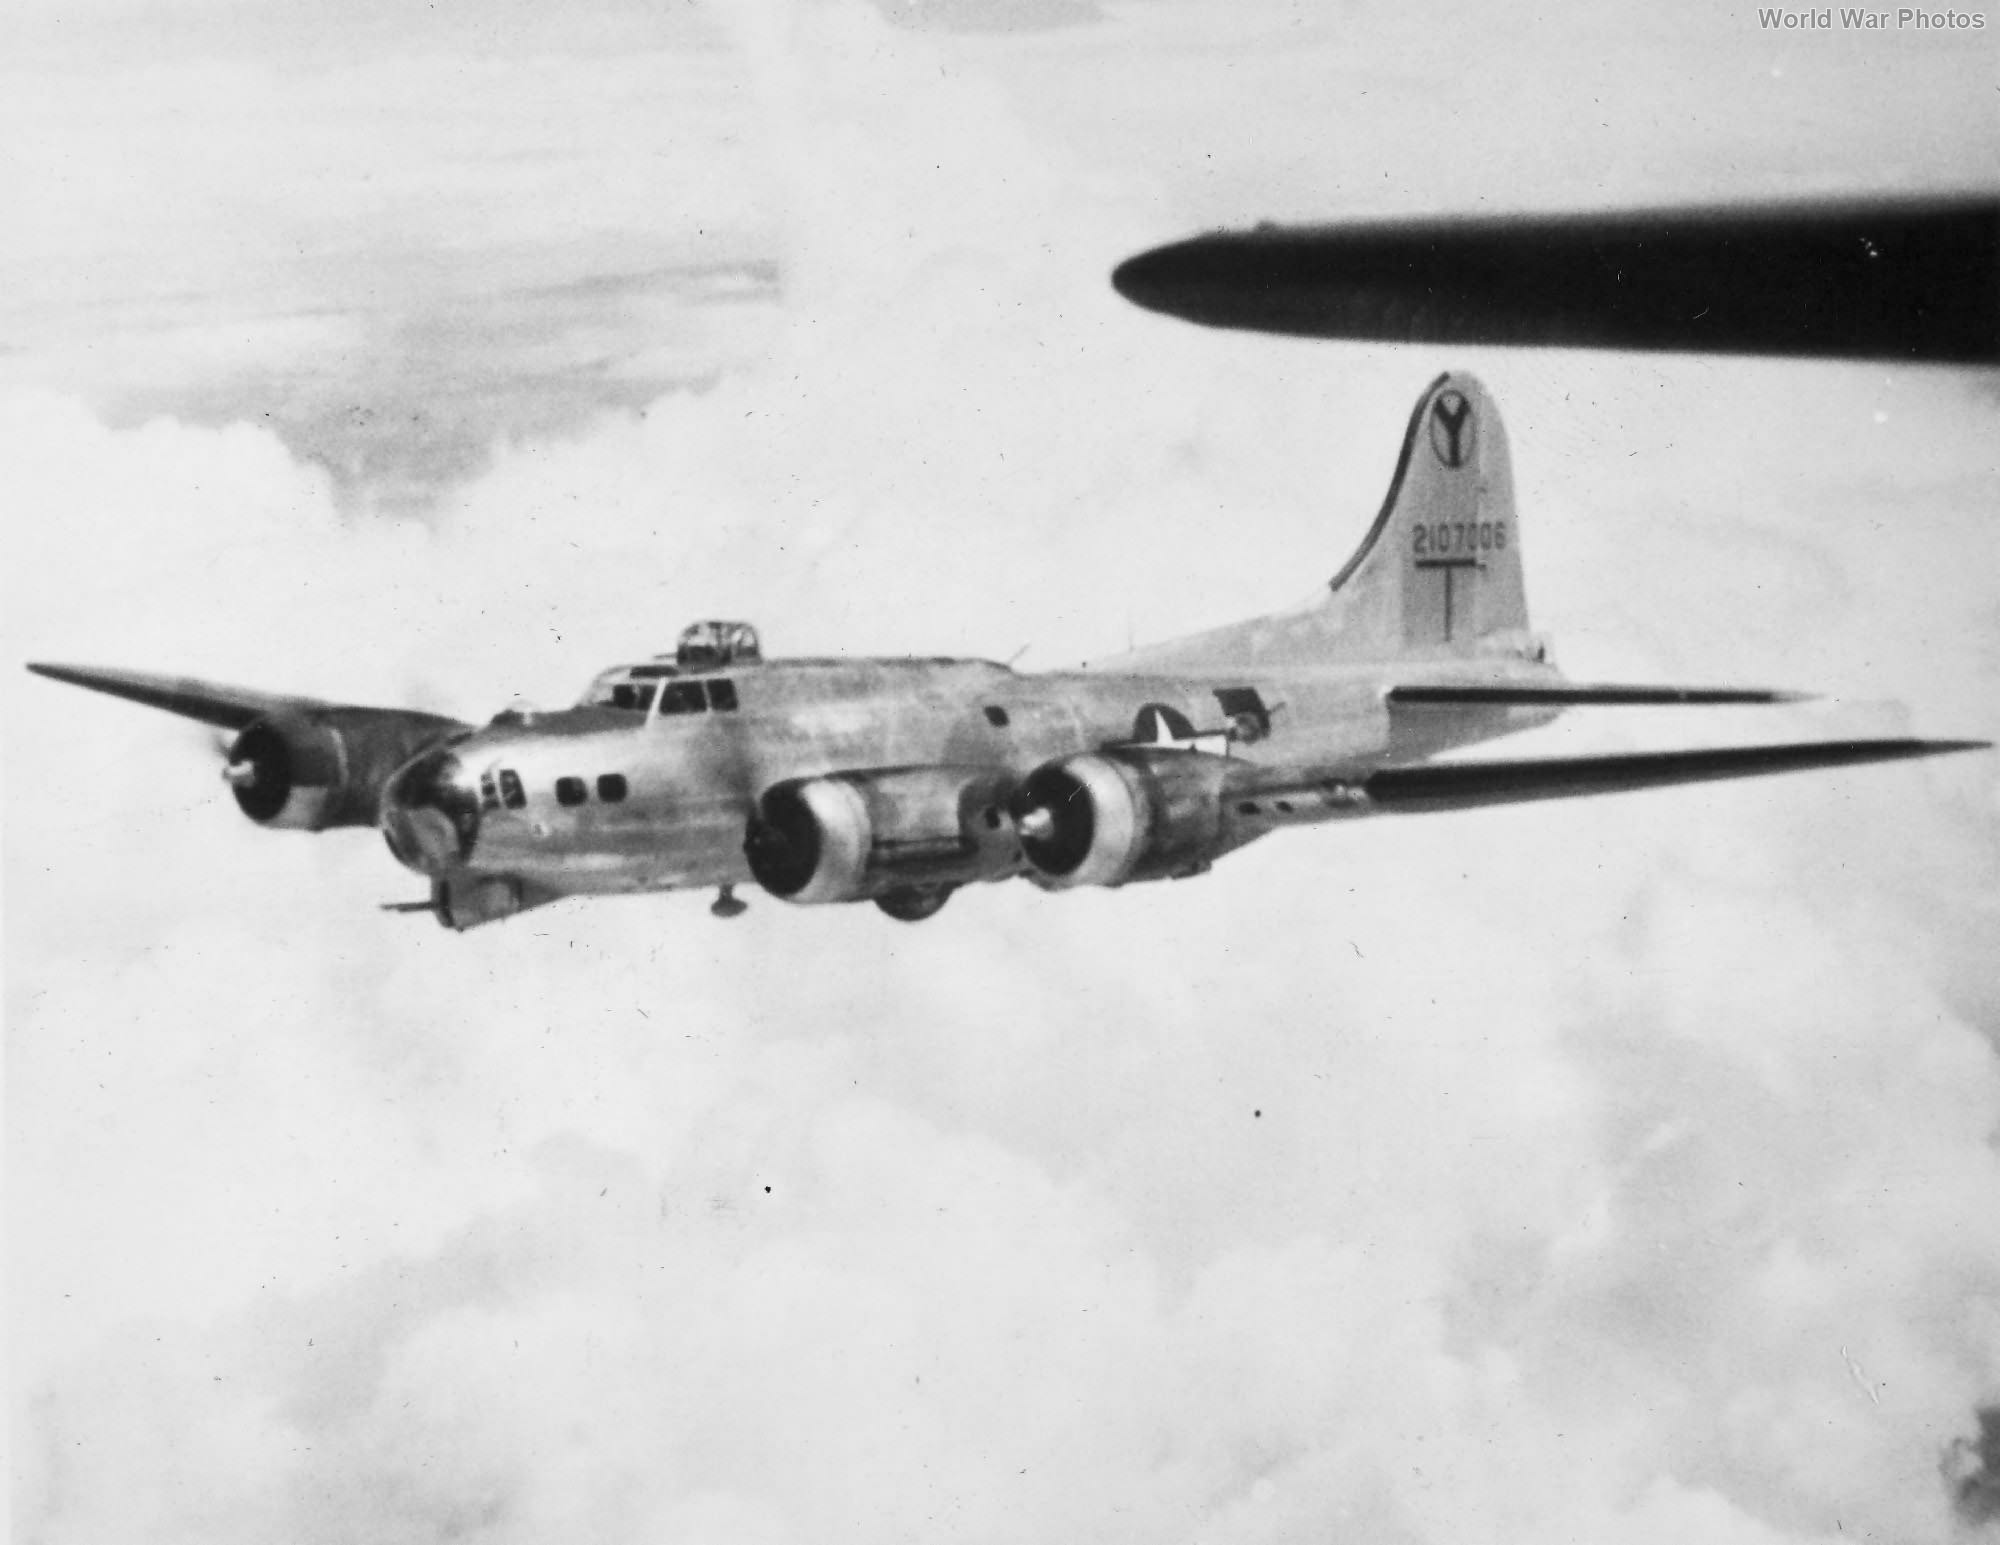 B-17 2nd BG 5